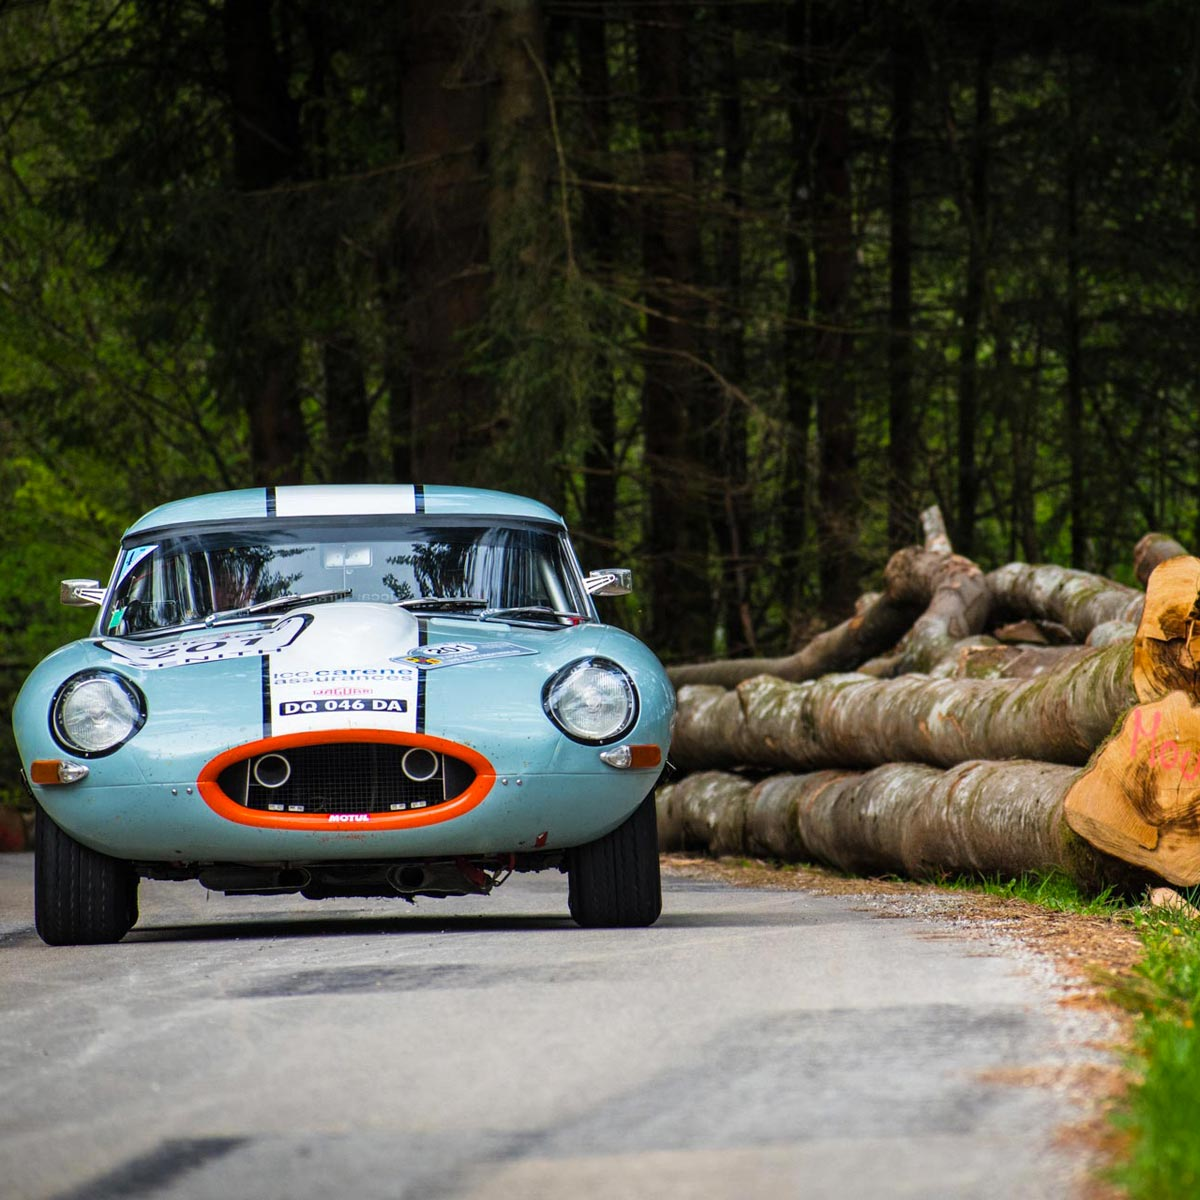 La Cote des Montres : Photo - Zenith Tour Auto Optic 2ooo - Mercredi 25 avril : Besançon – Megève